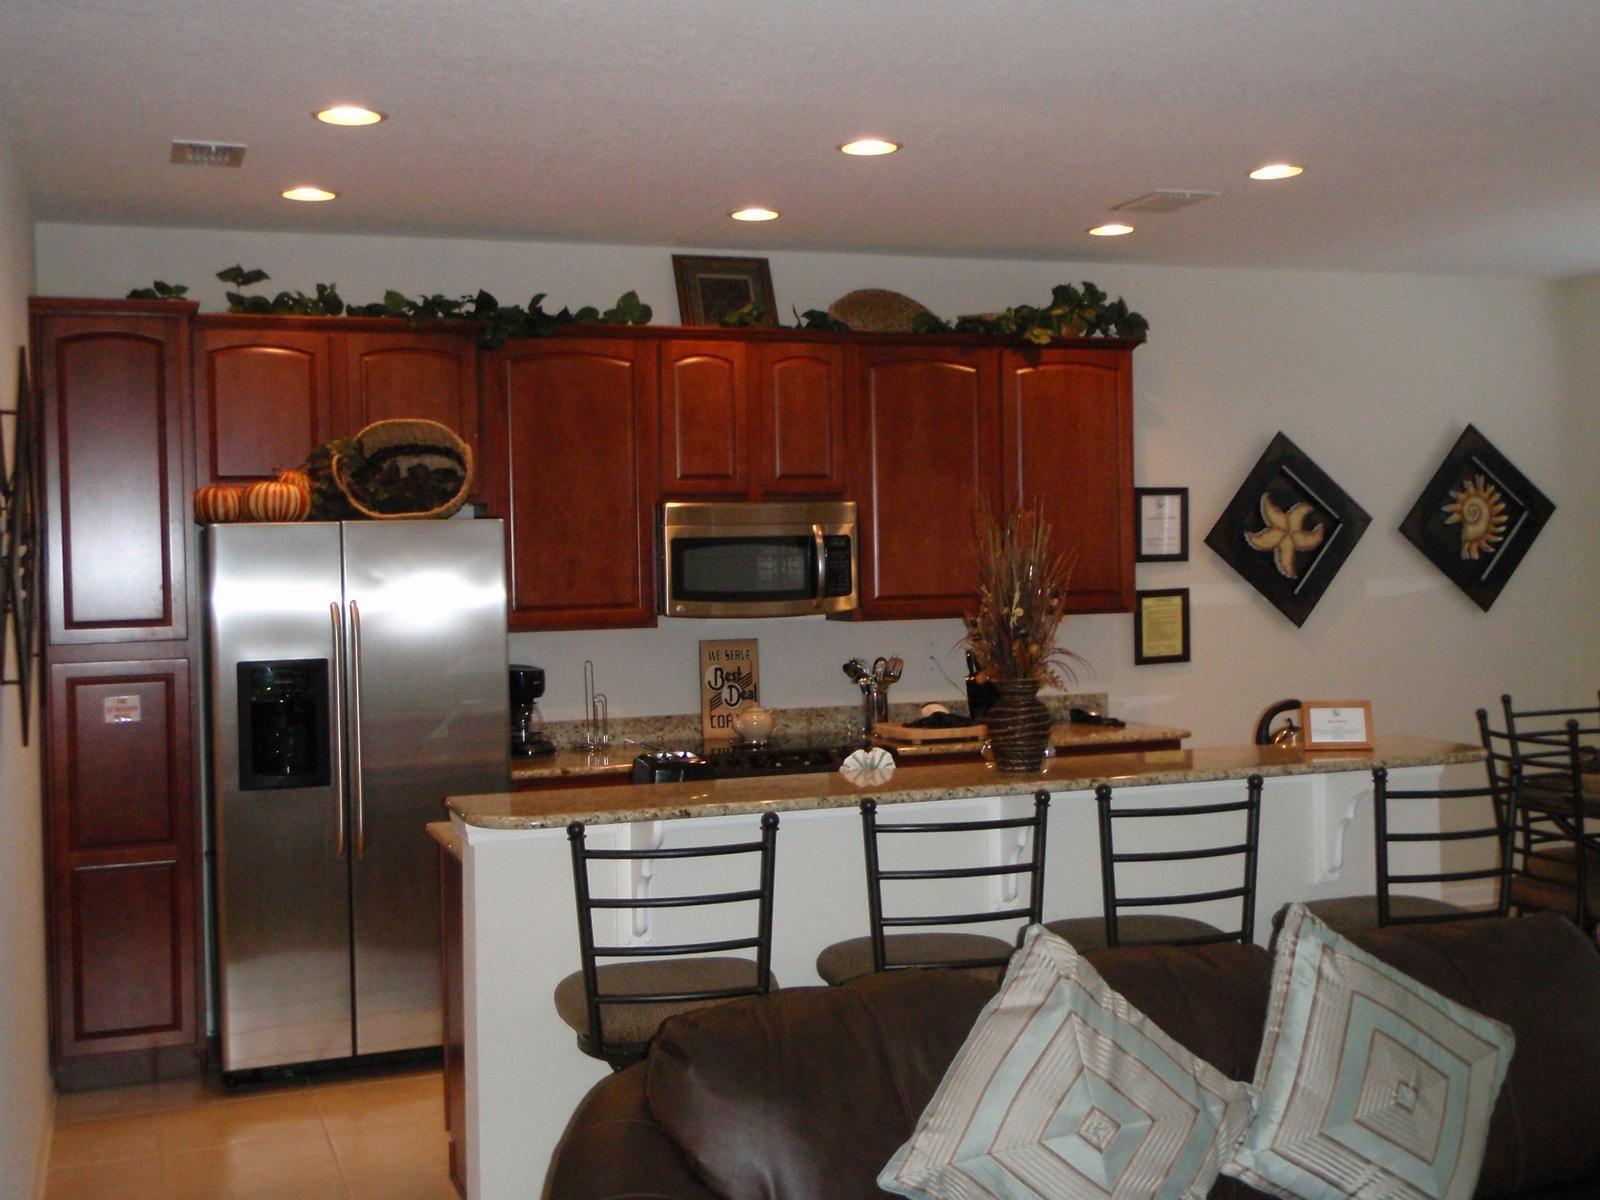 Barstools over the kitchen isl....